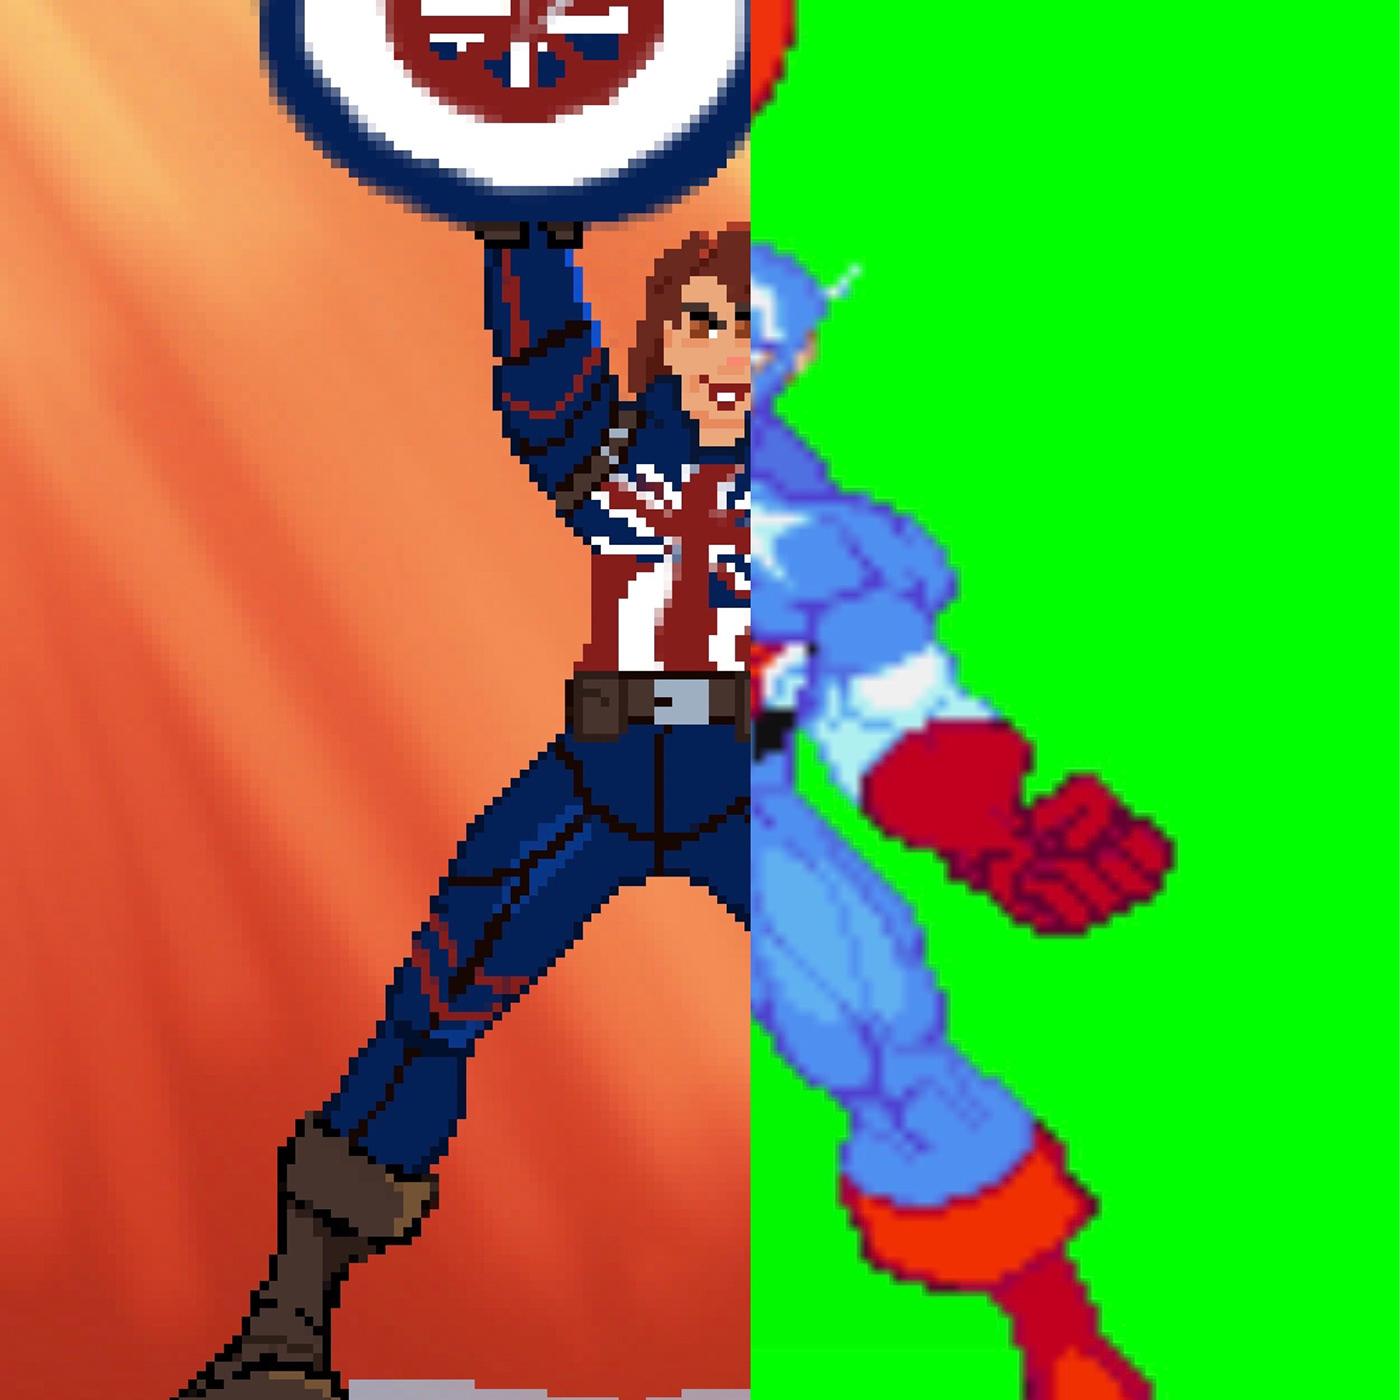 capcom captain carter captainamerica digitalart mcu peggy carter pixel Pixel art redesign video game